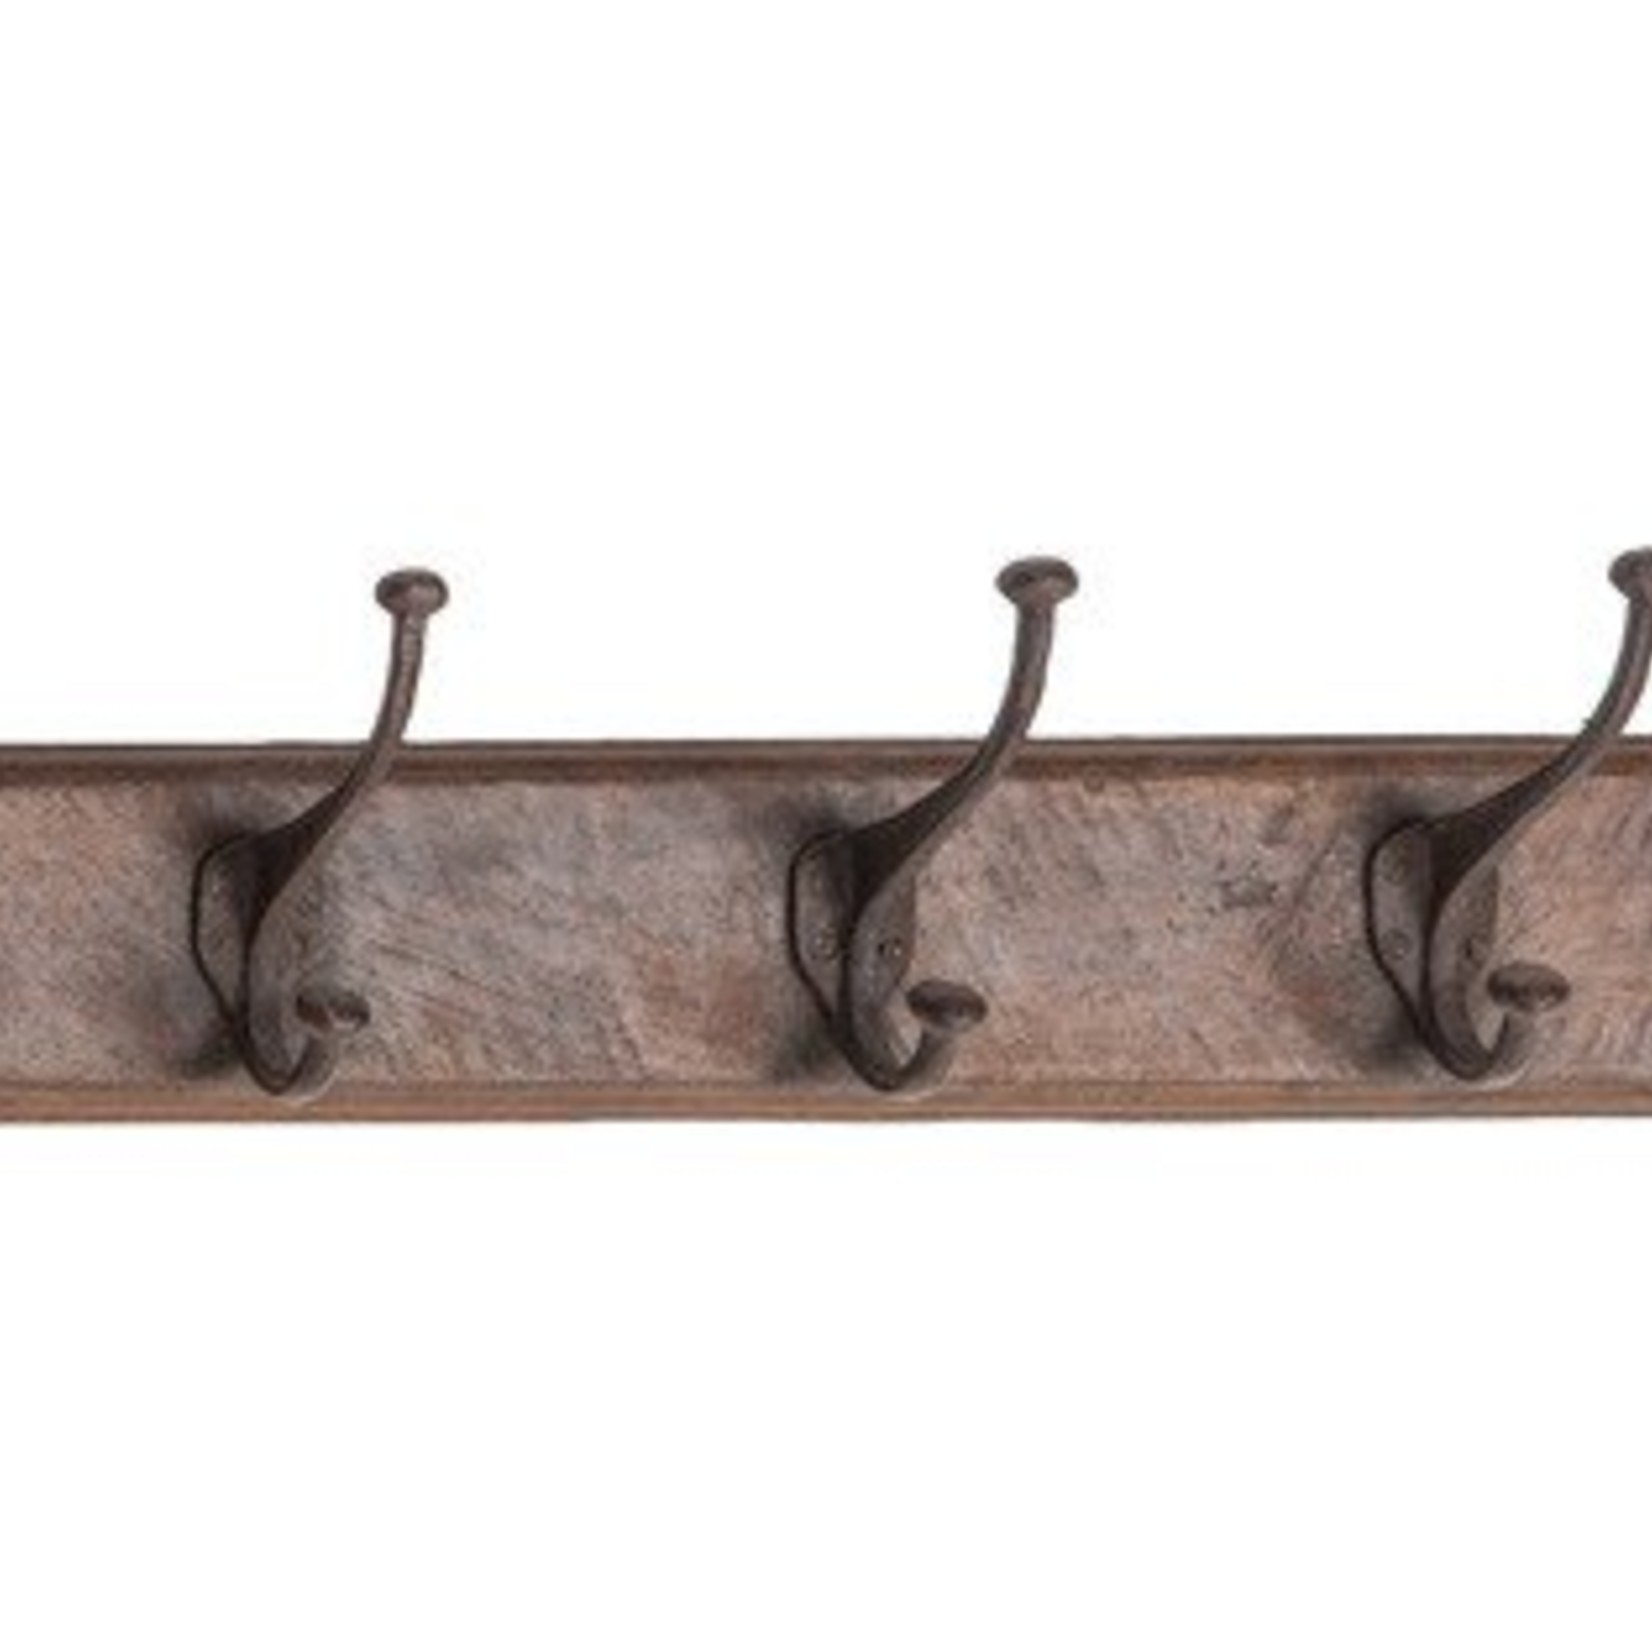 Wood with 5 Metal Hooks 88579